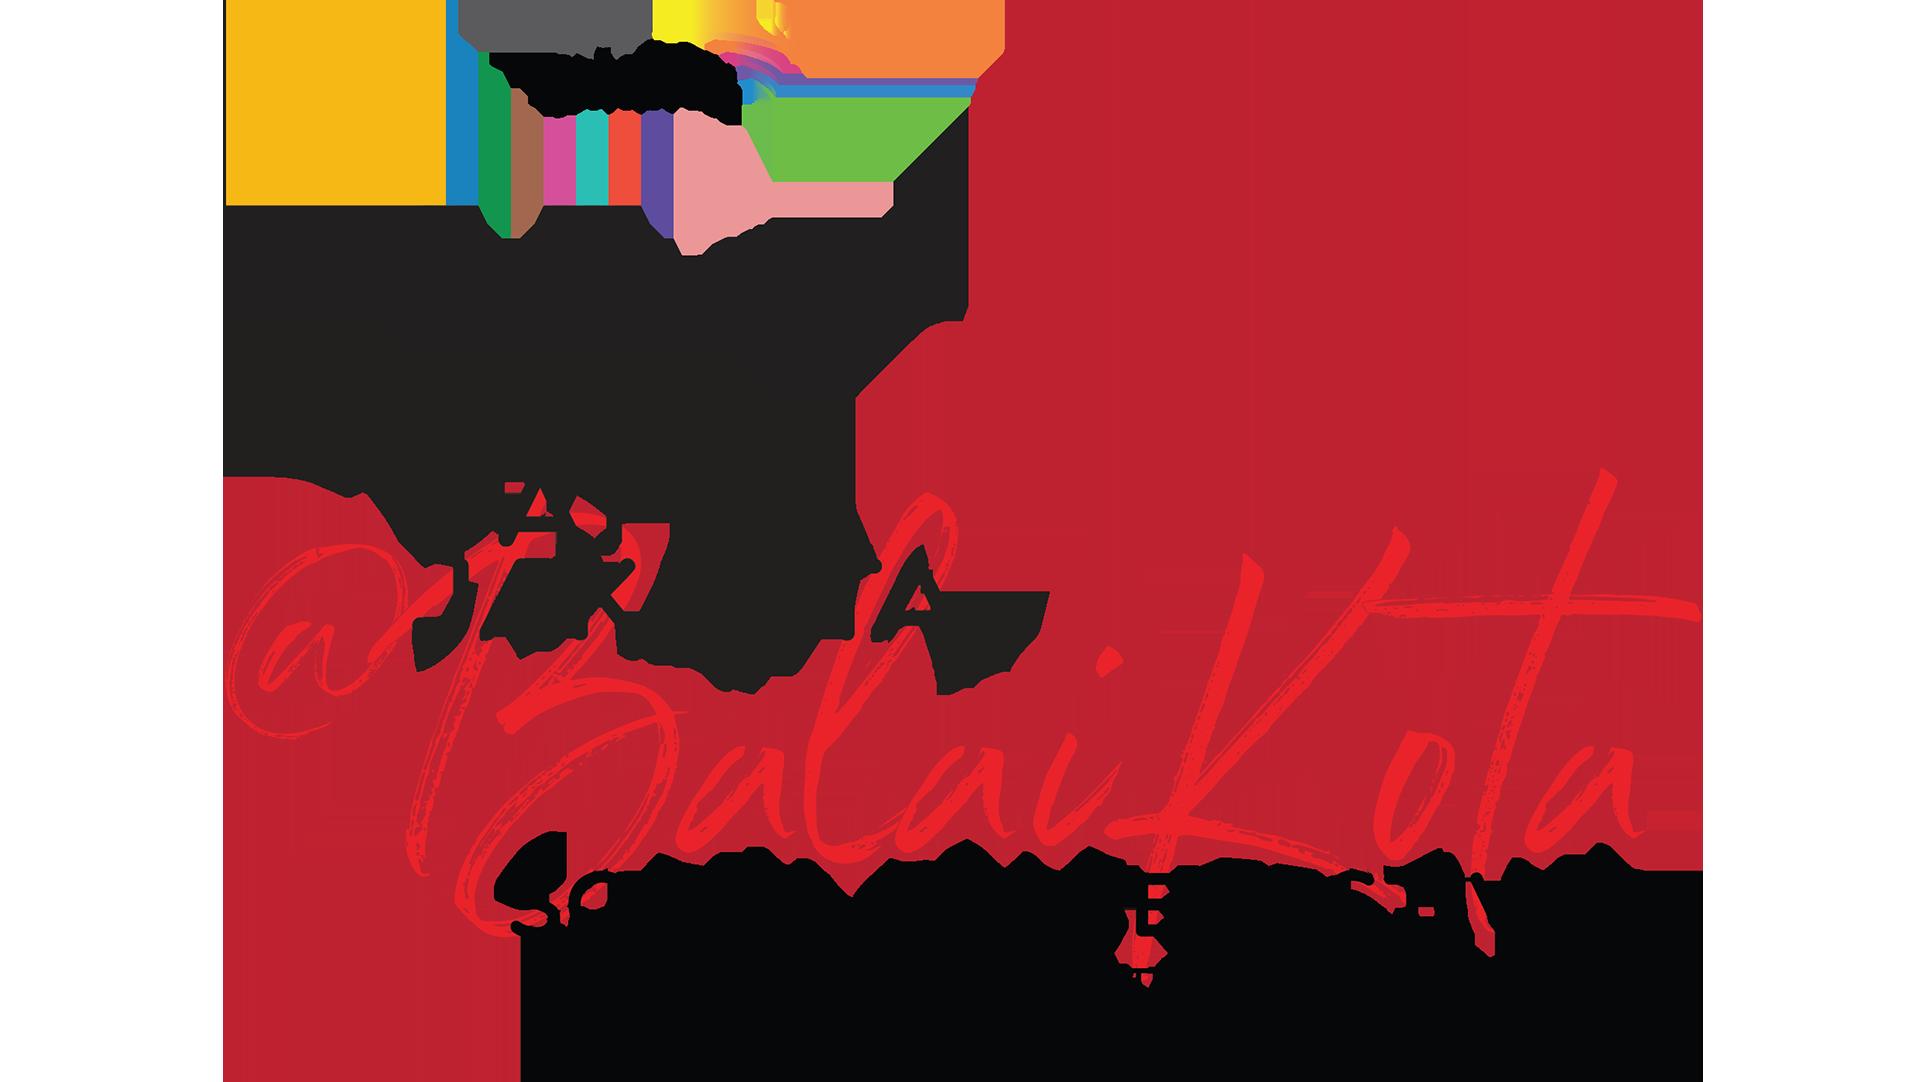 CONCERT - JazzDayJakarta2018-01.png